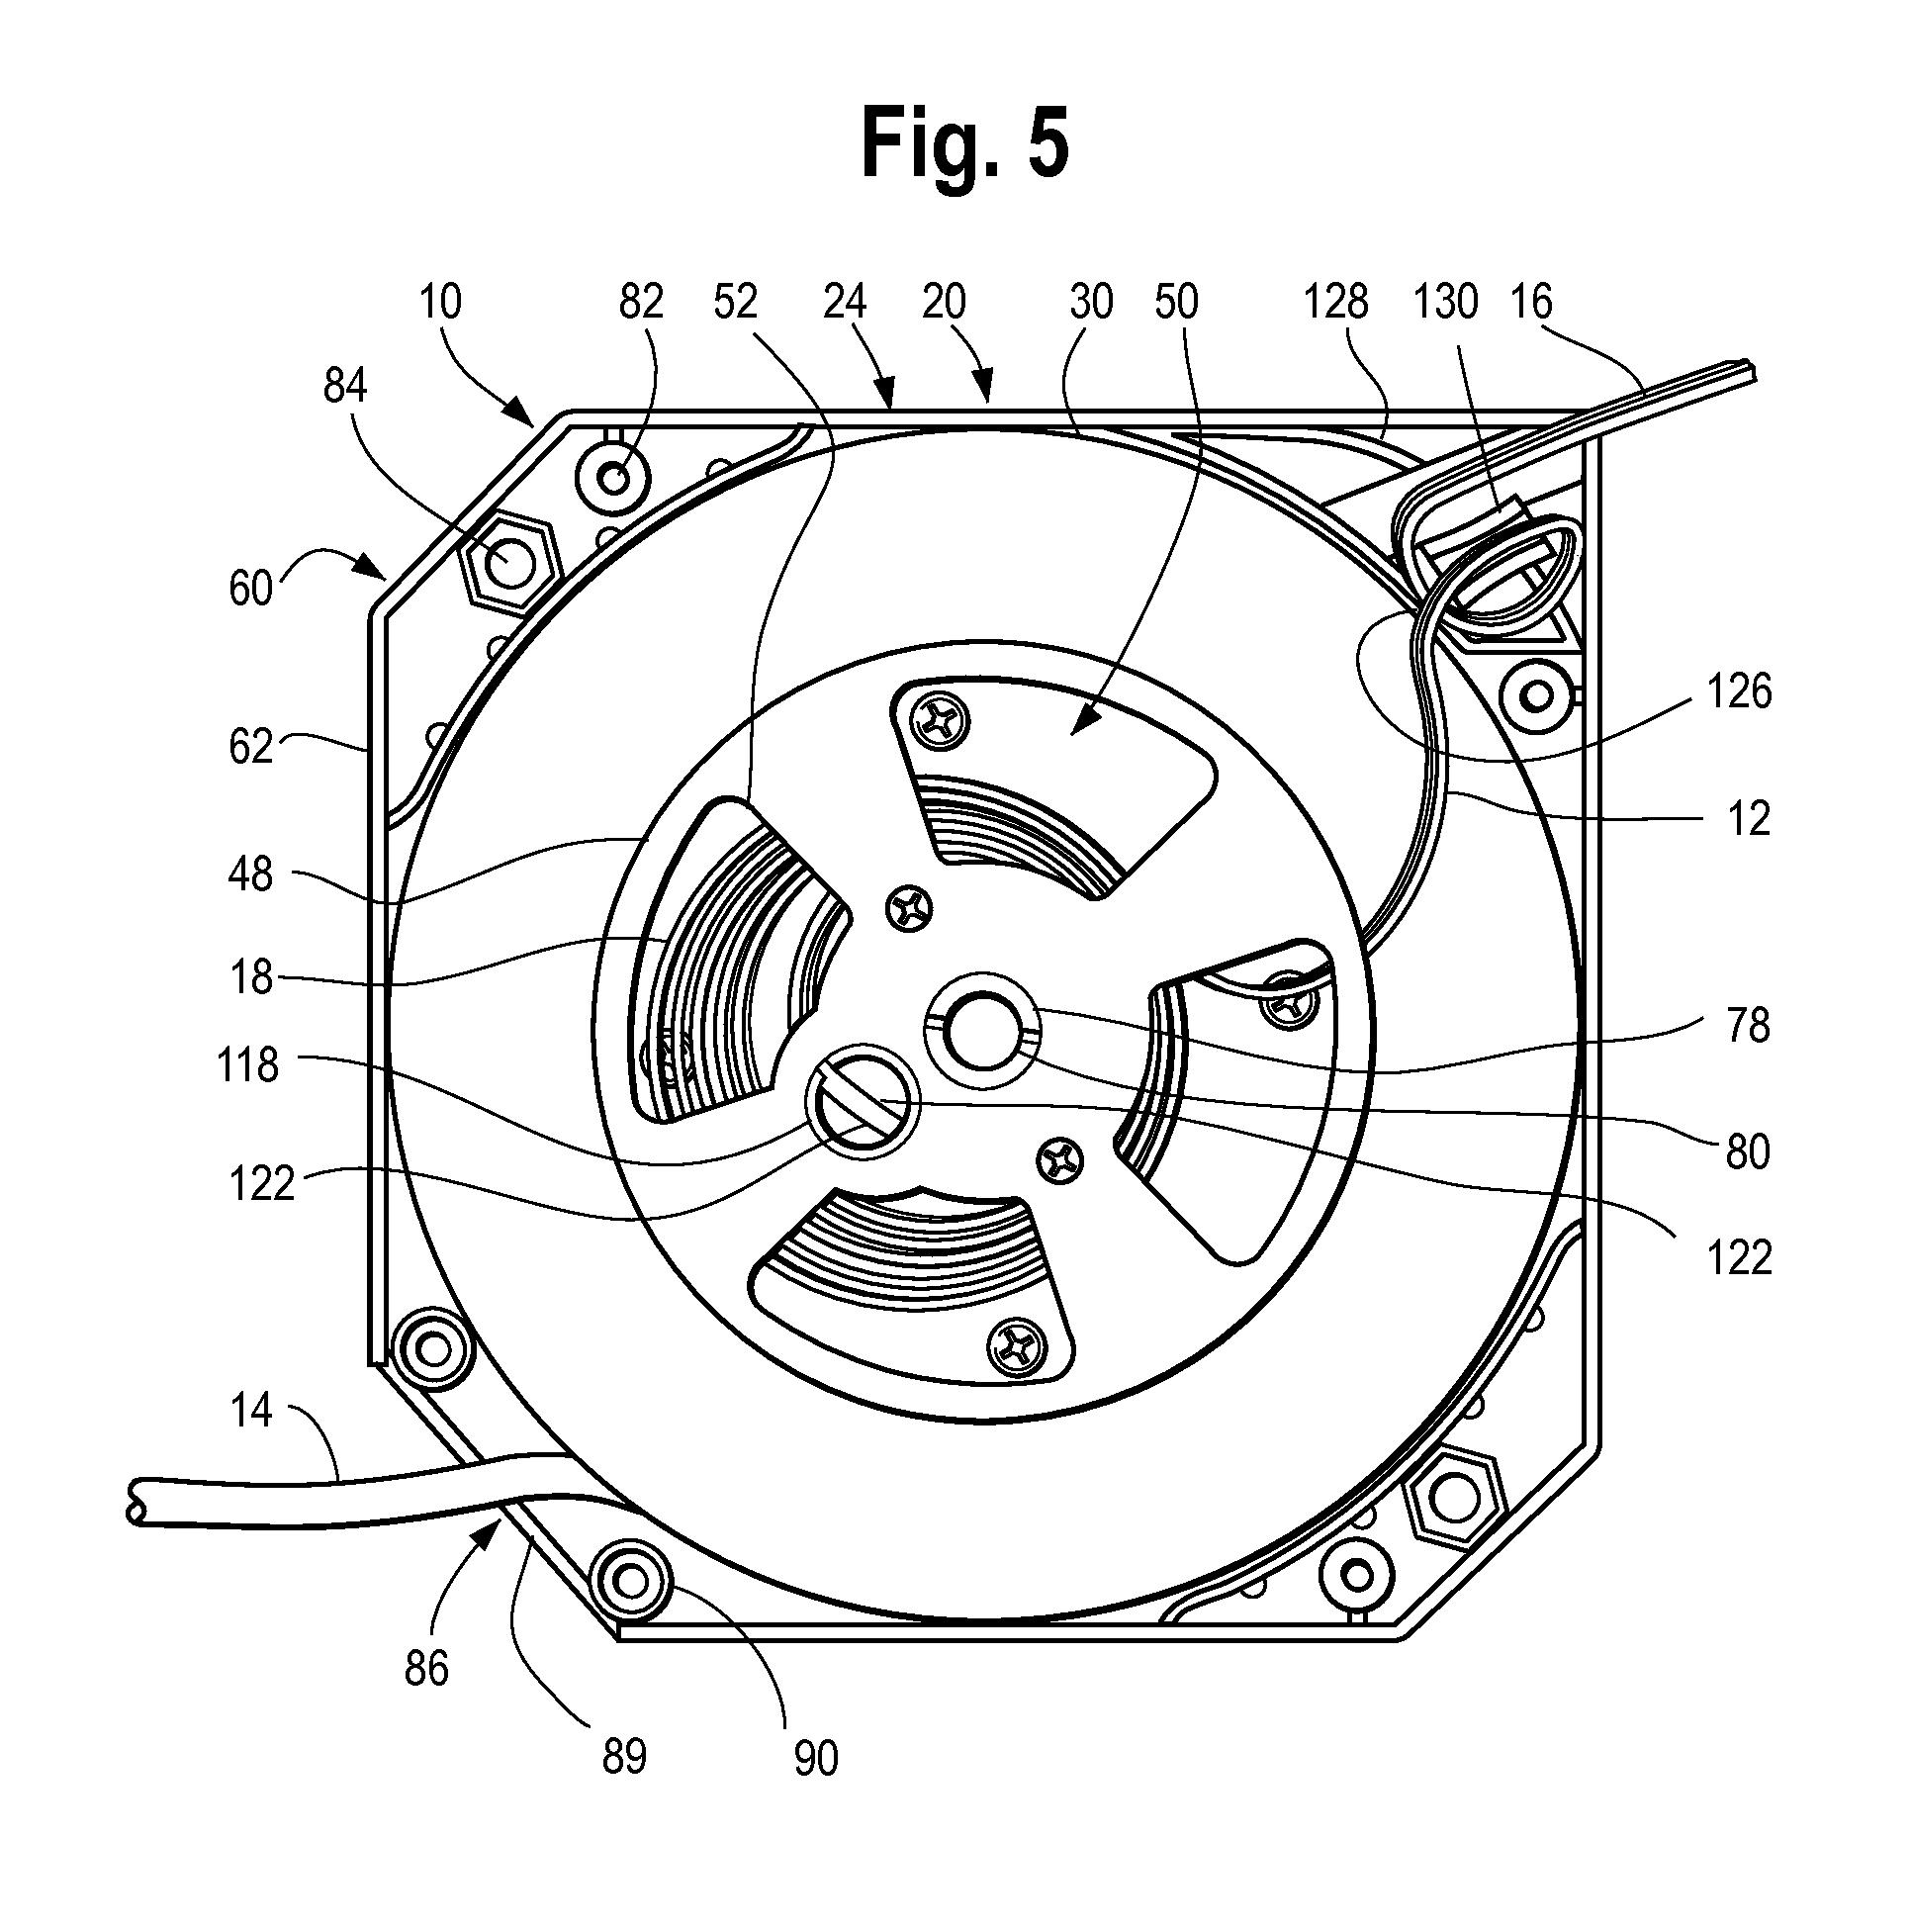 patent us8387763 - retractable cord reel